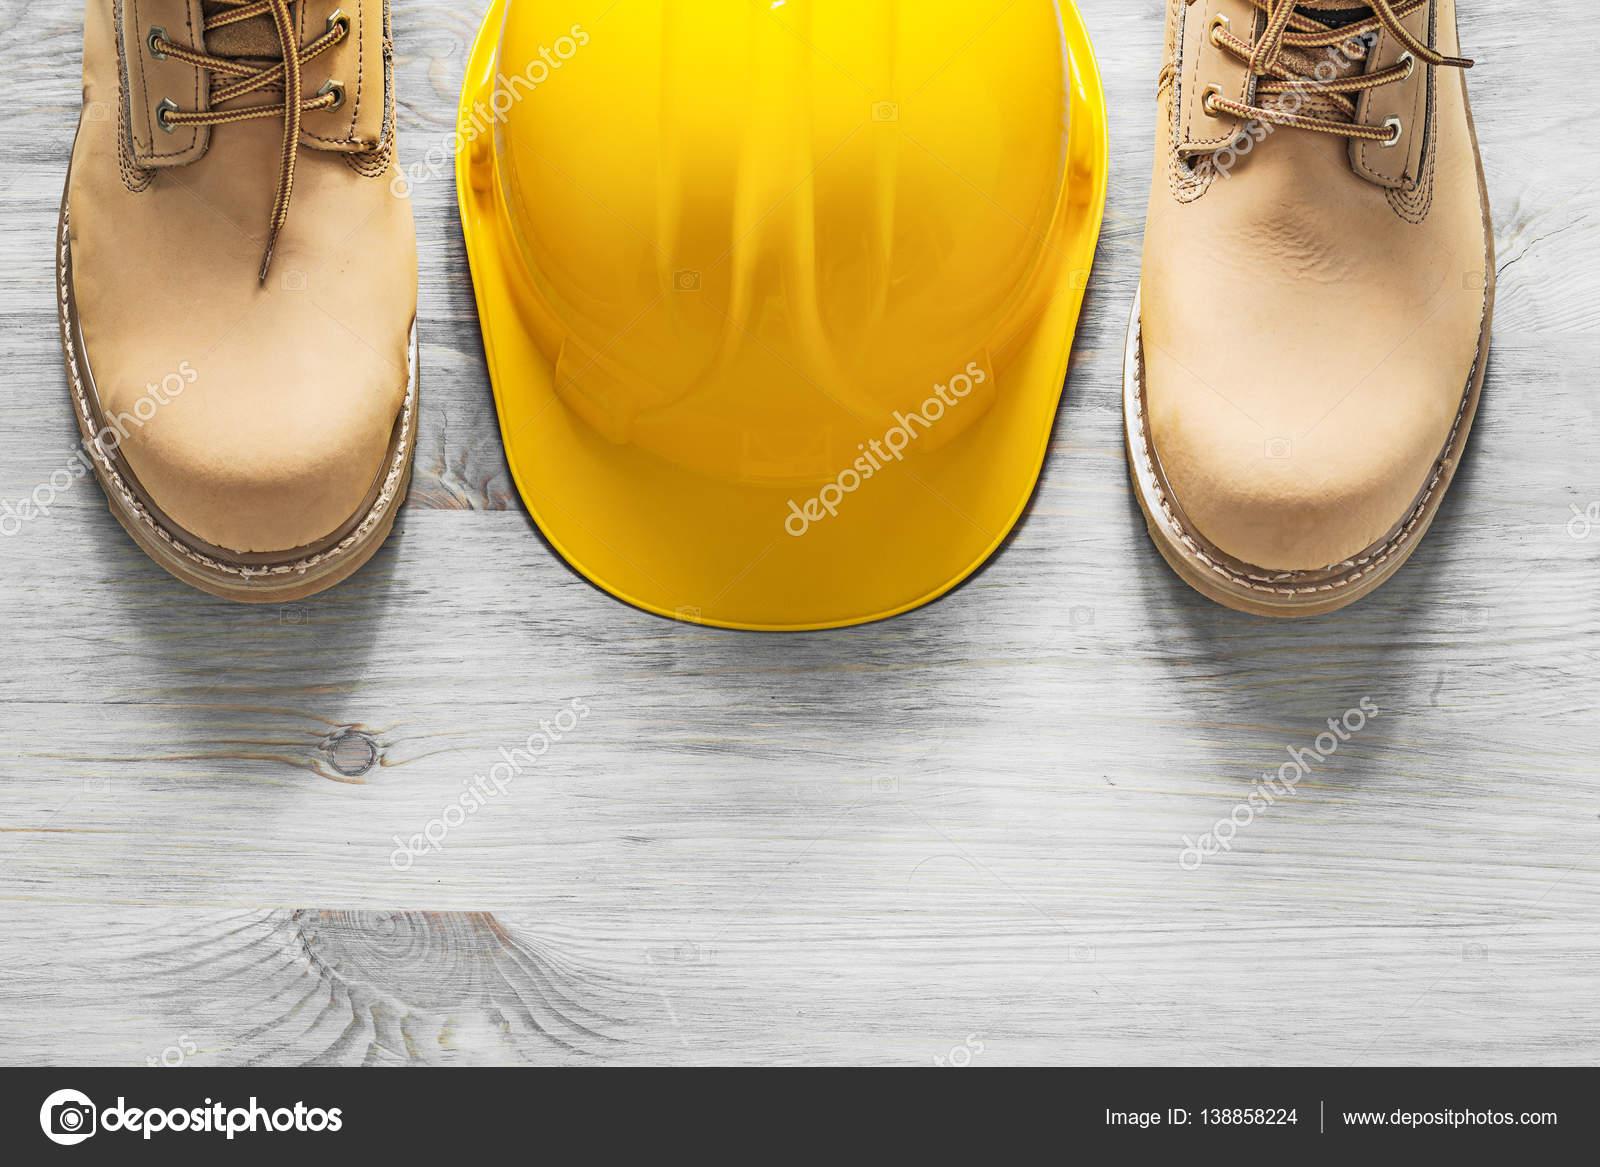 8e985420643 Ζευγάρι των αδιάβροχες μπότες κράνος με βάση ξύλινη σανίδα constru– εικόνα  αρχείου